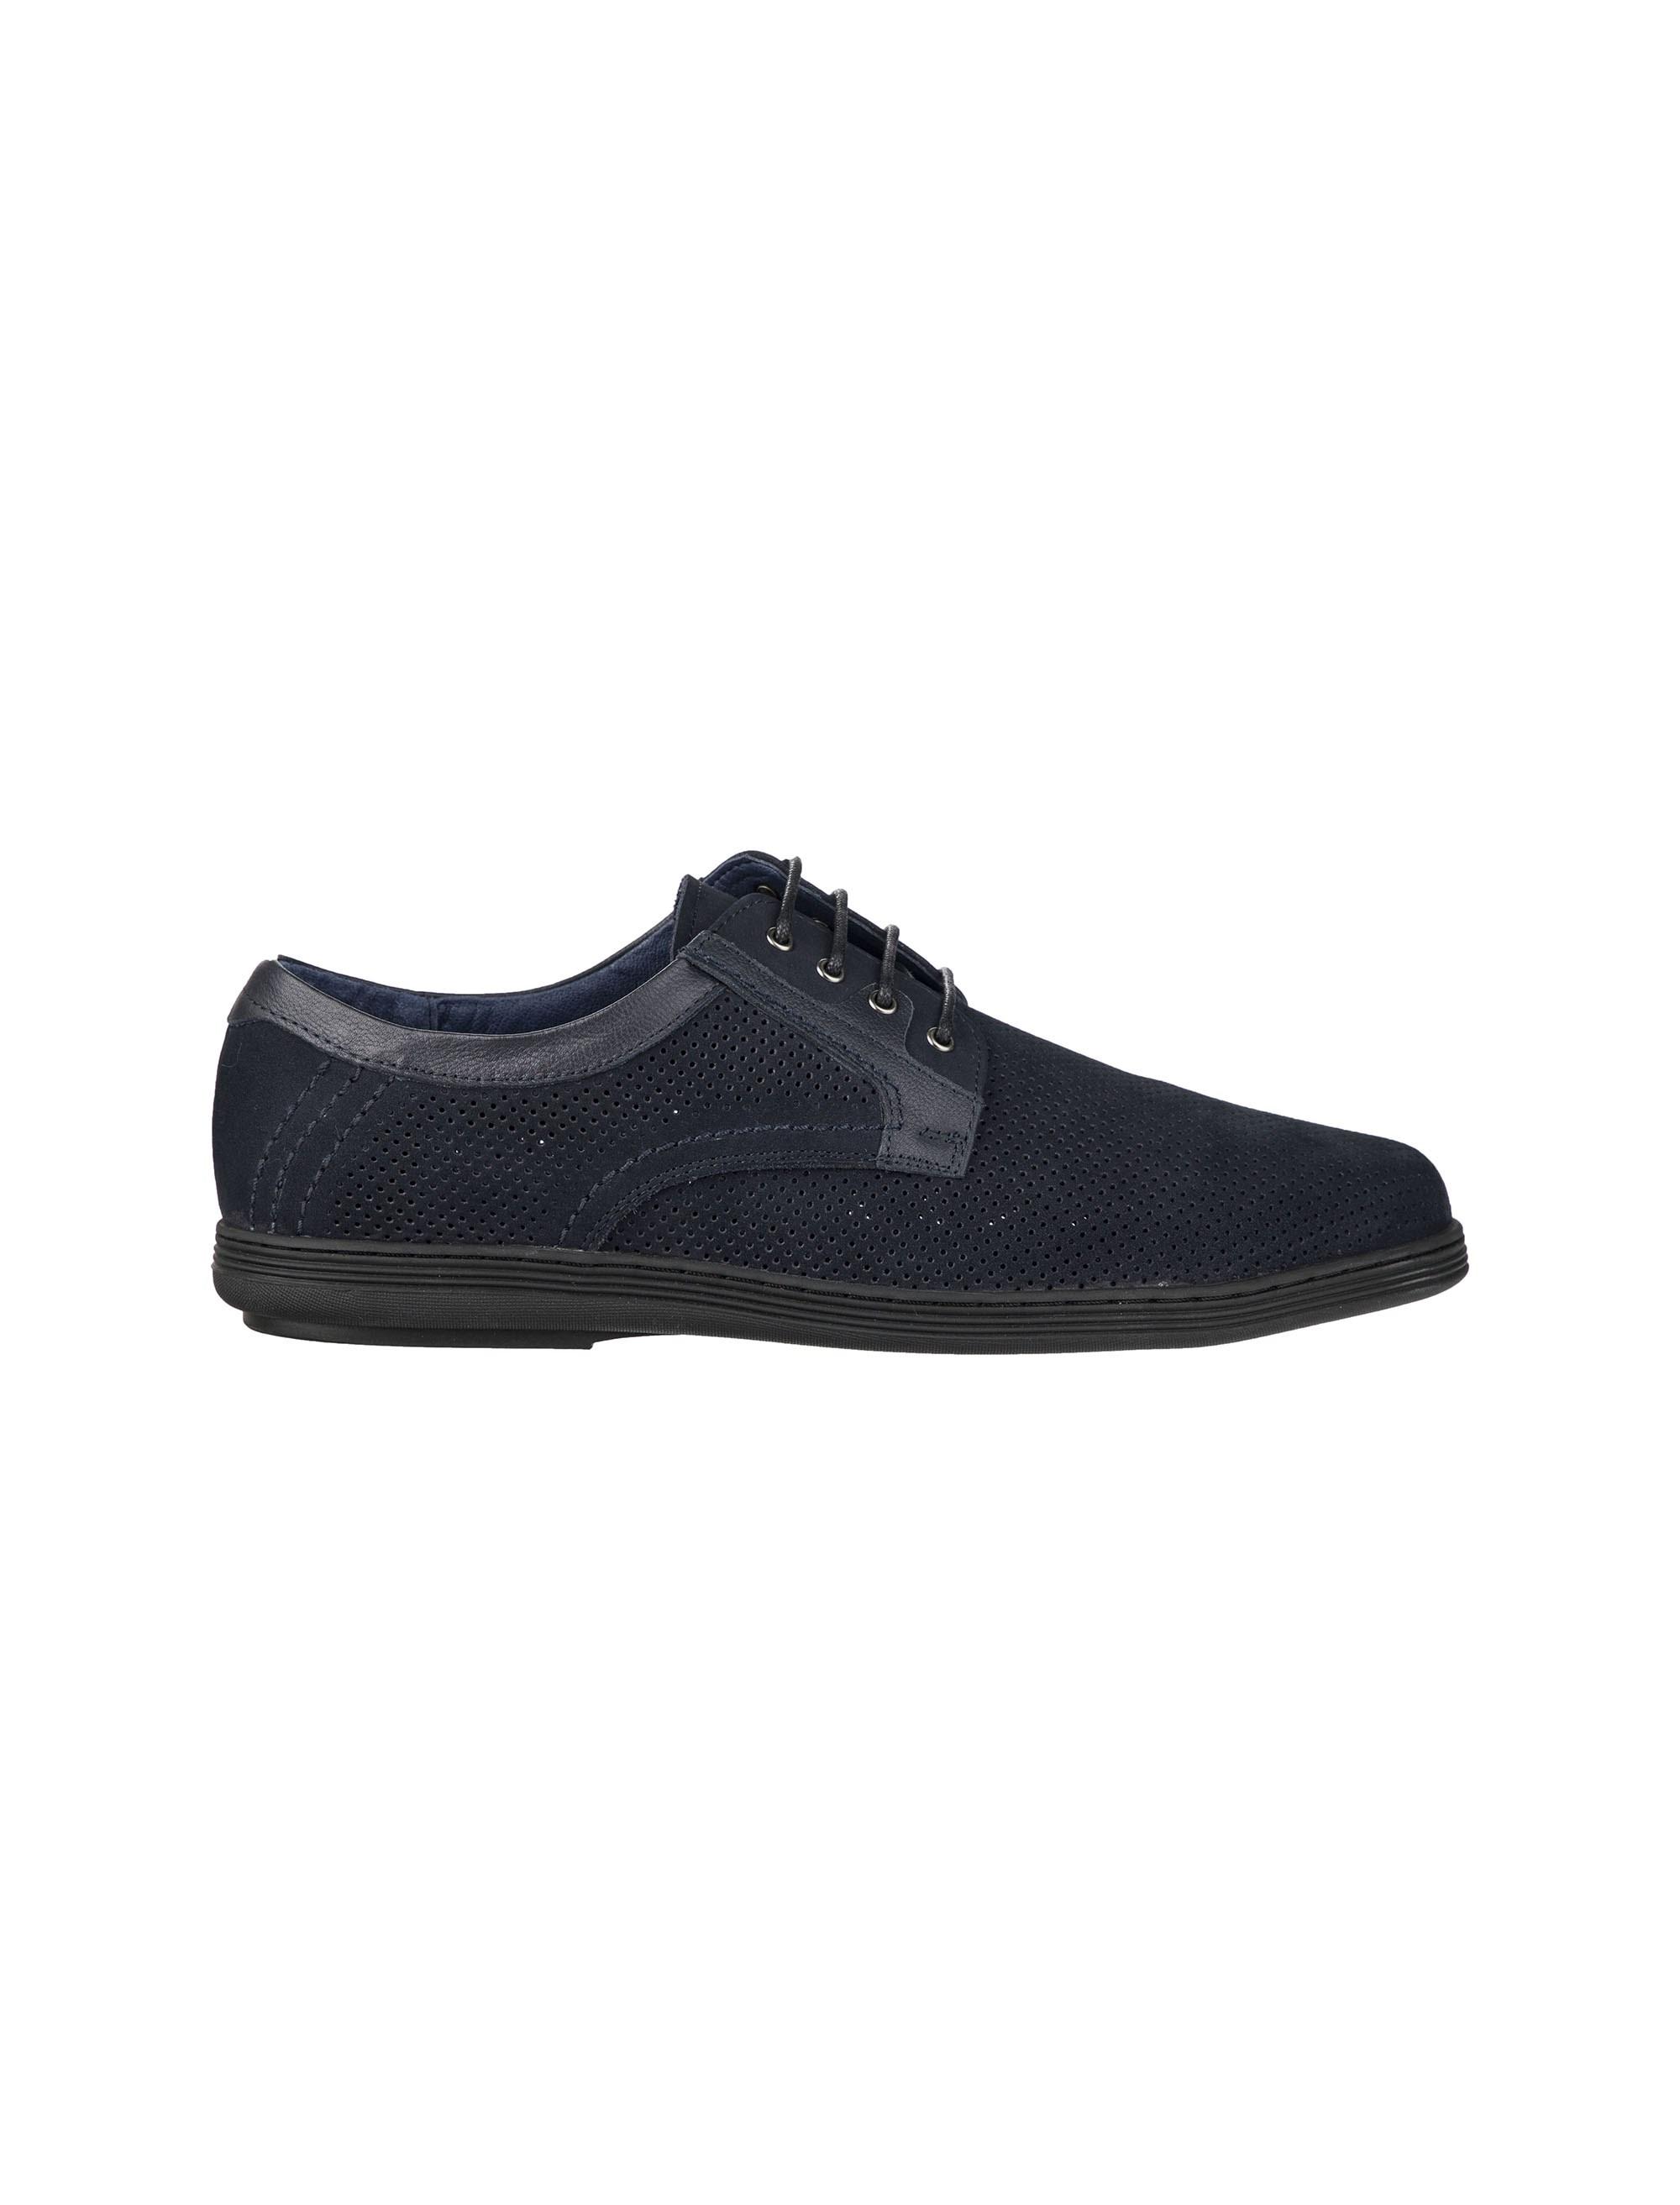 کفش اداری چرم بندی مردانه